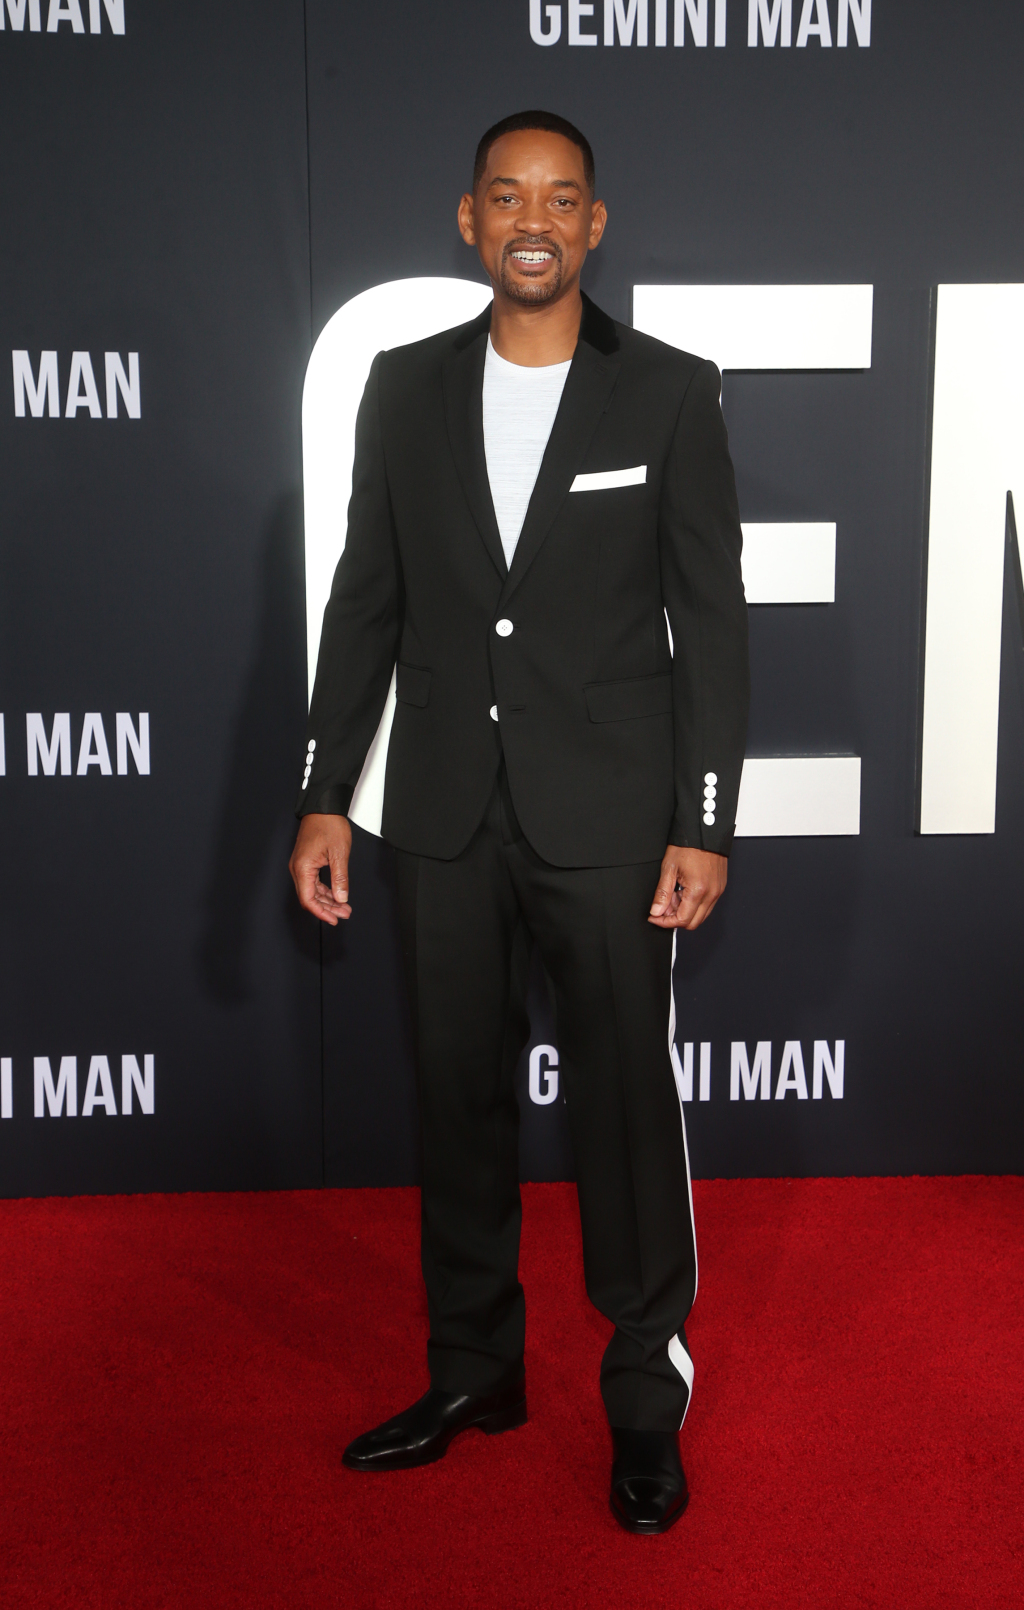 Paramount Pictures' Premiere Of Gemini Man